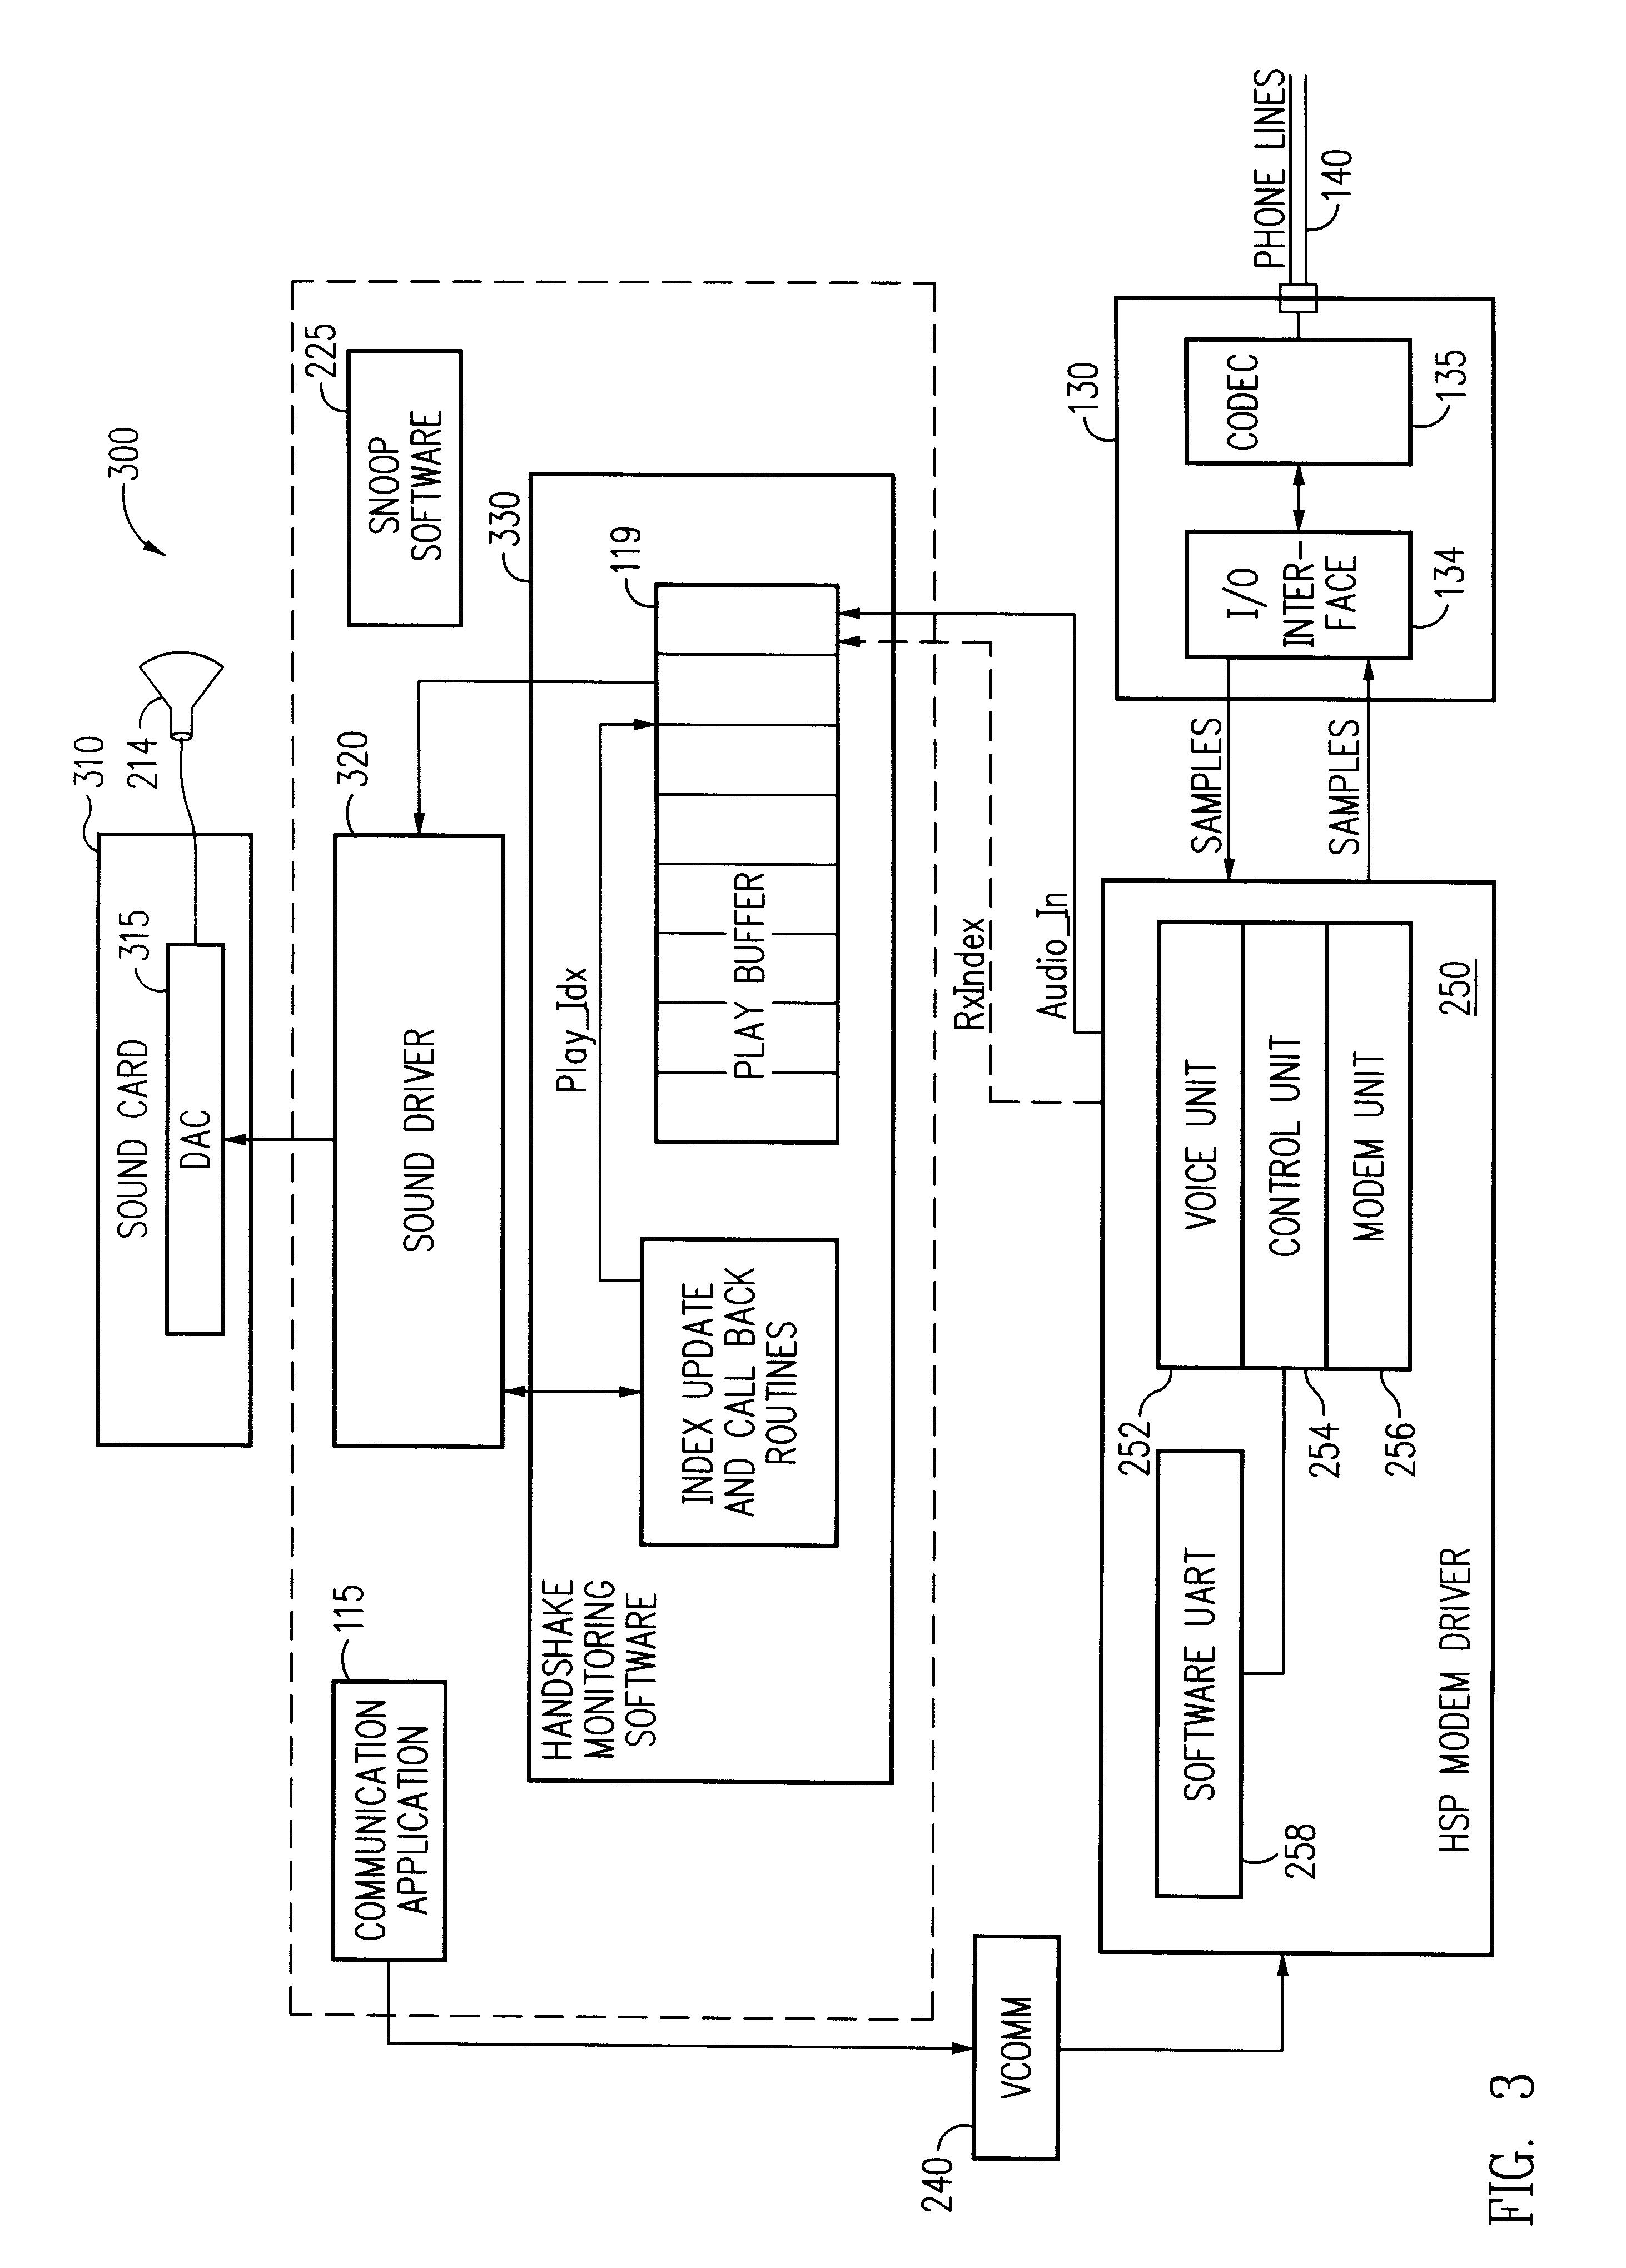 patent us6252920 - host signal processor modem and telephone